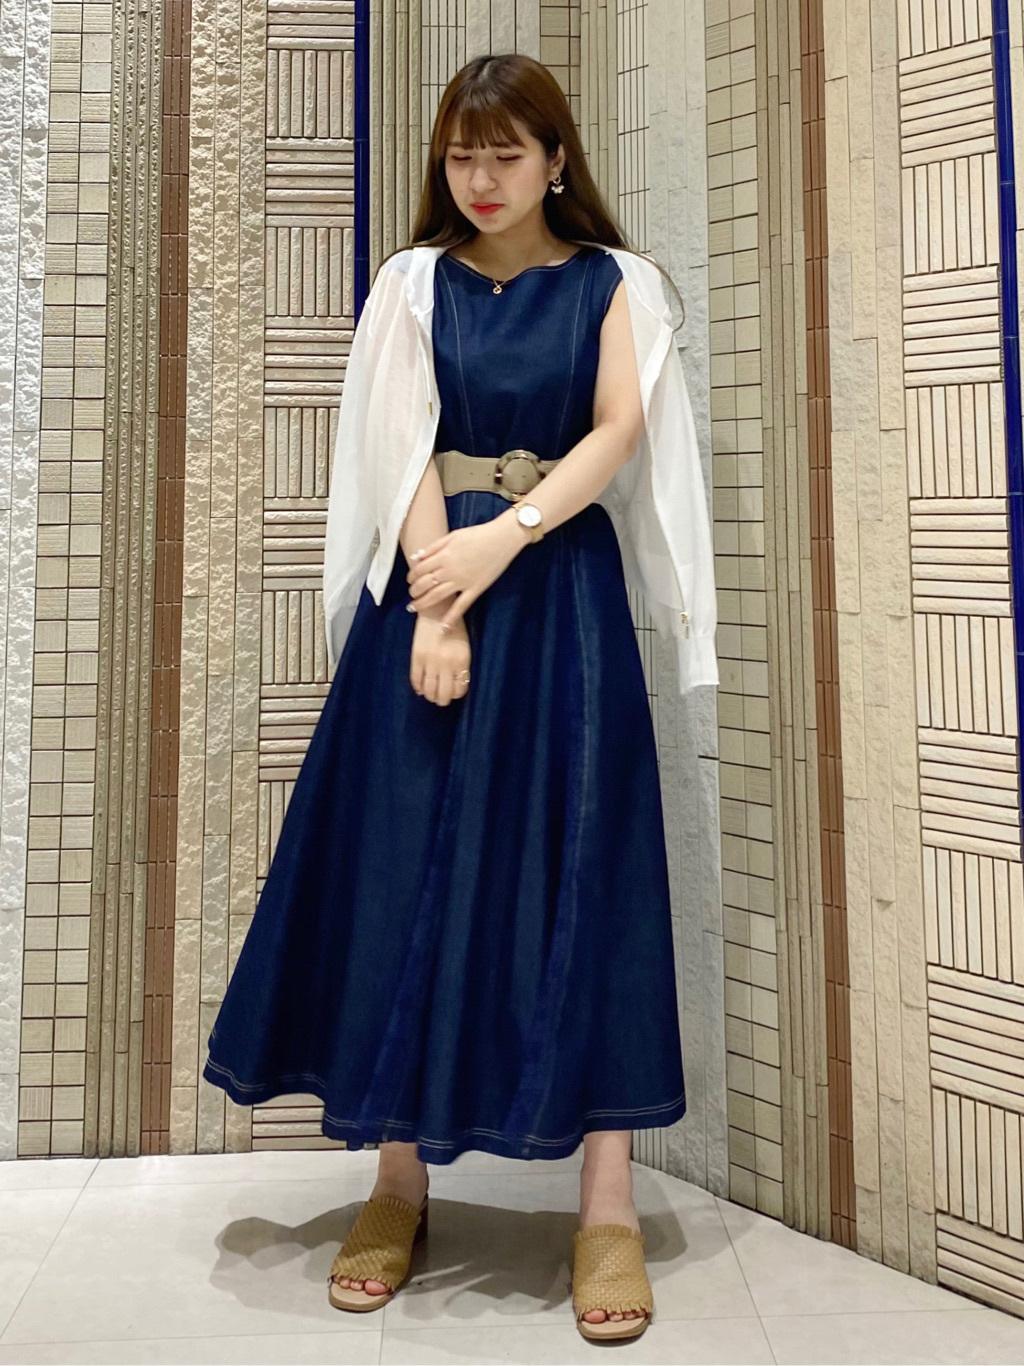 rie♡(158cm)